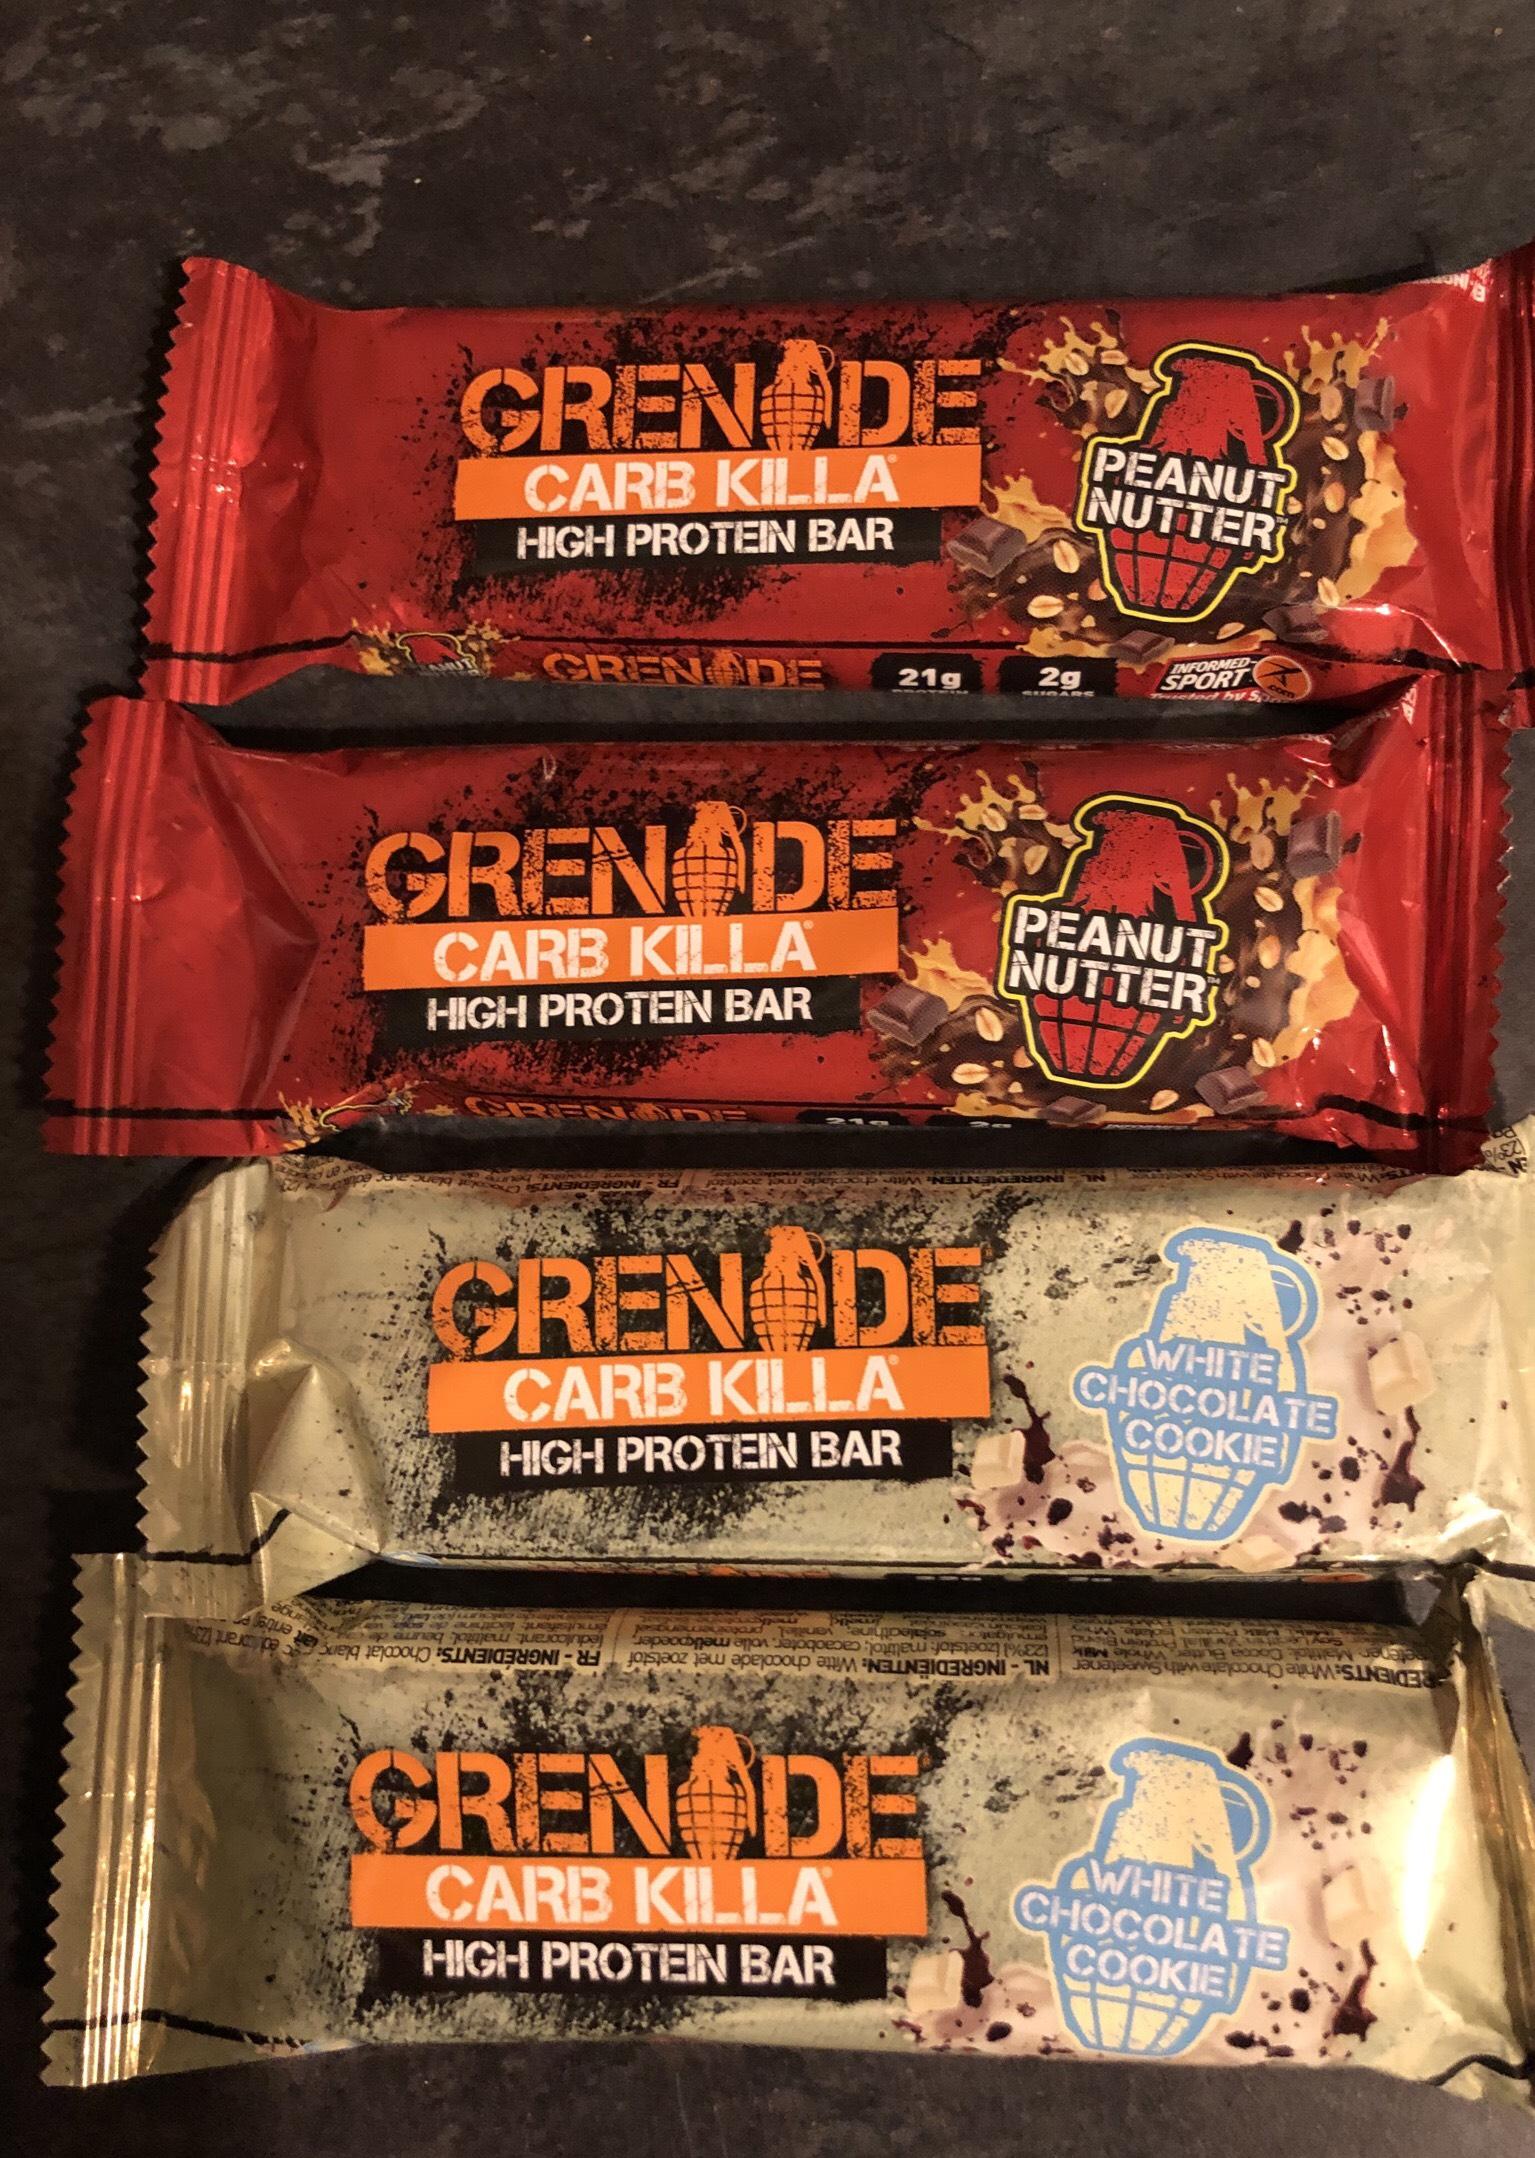 Grenade Carb Killa instore at B&M for £1.29